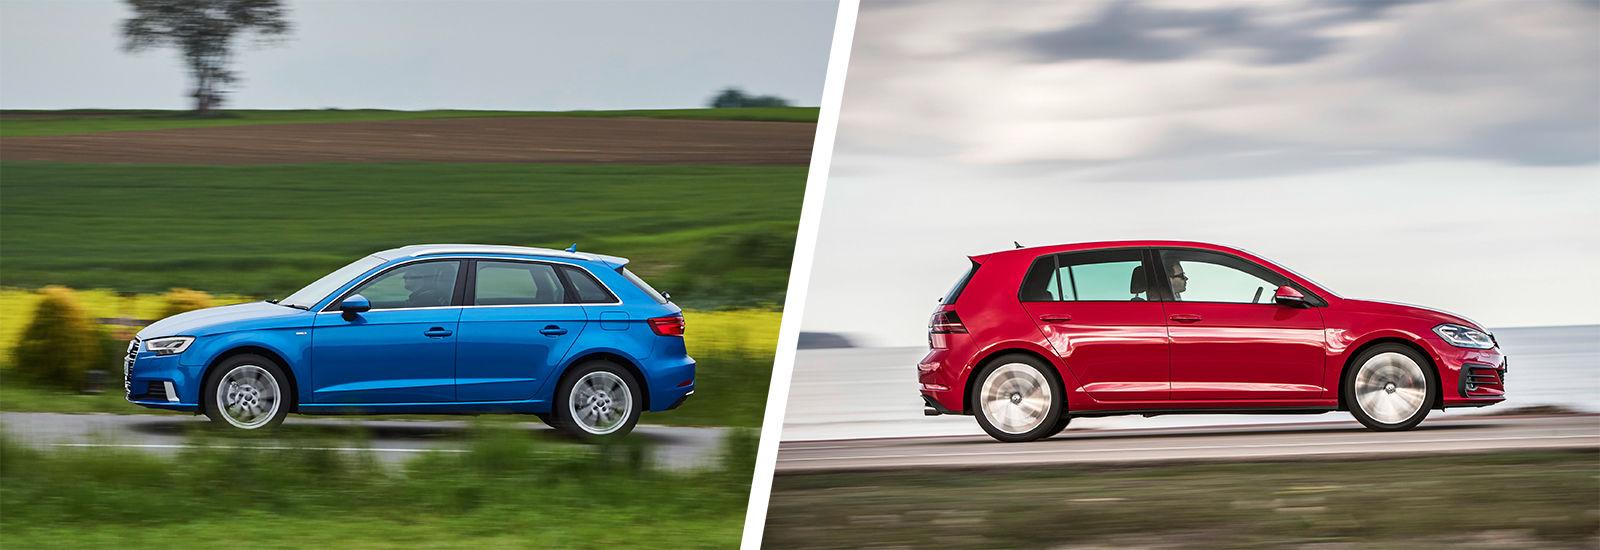 Audi a3 vs vw golf driving